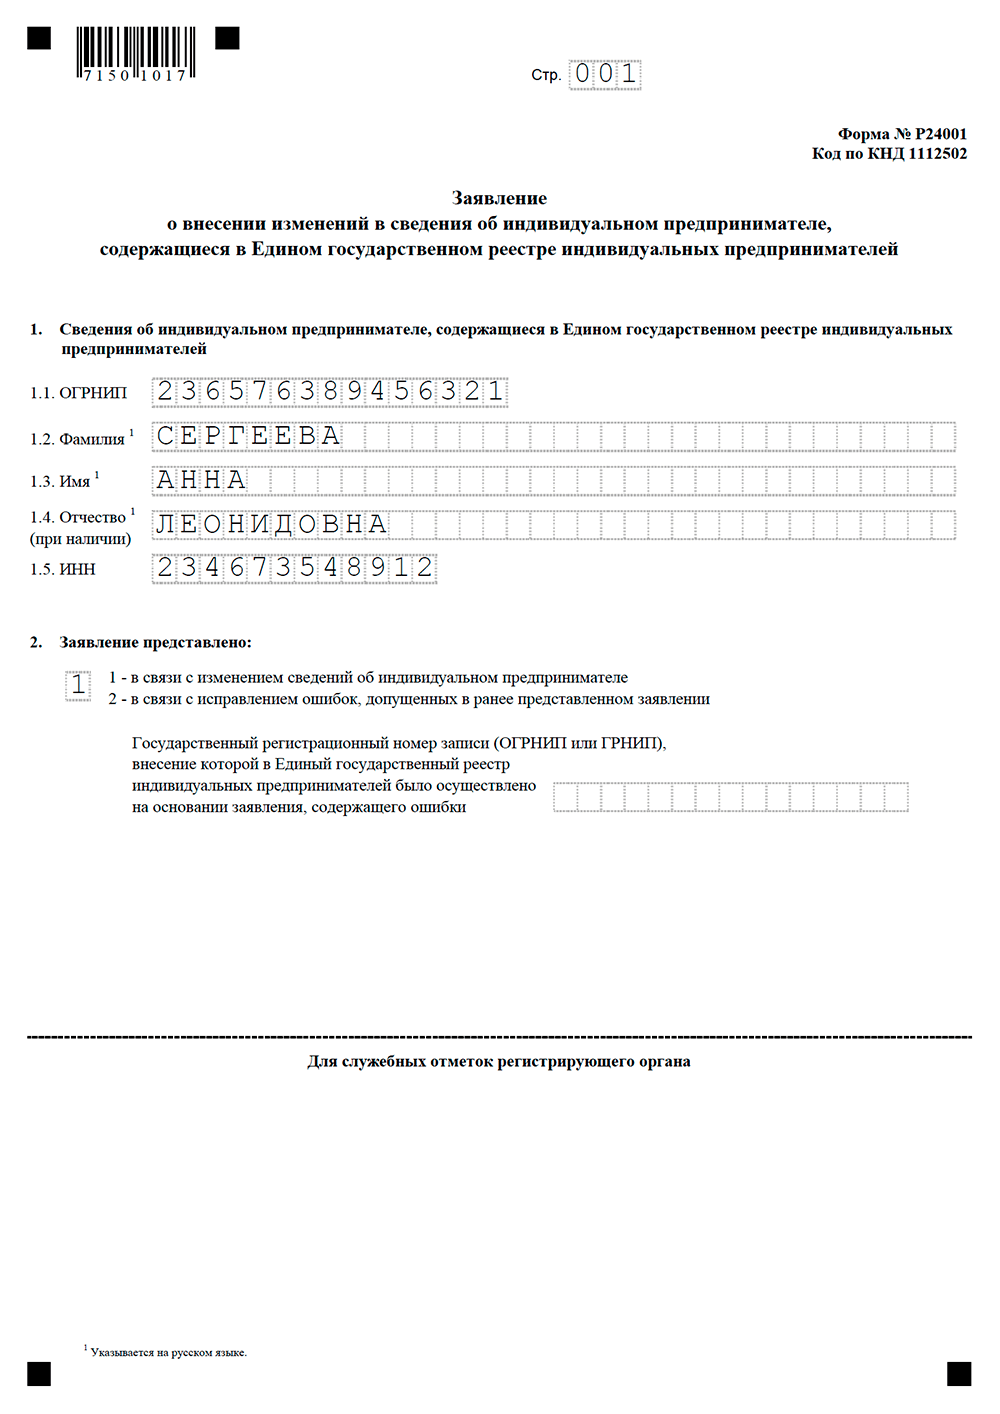 онлайн сертификат по бухгалтерии